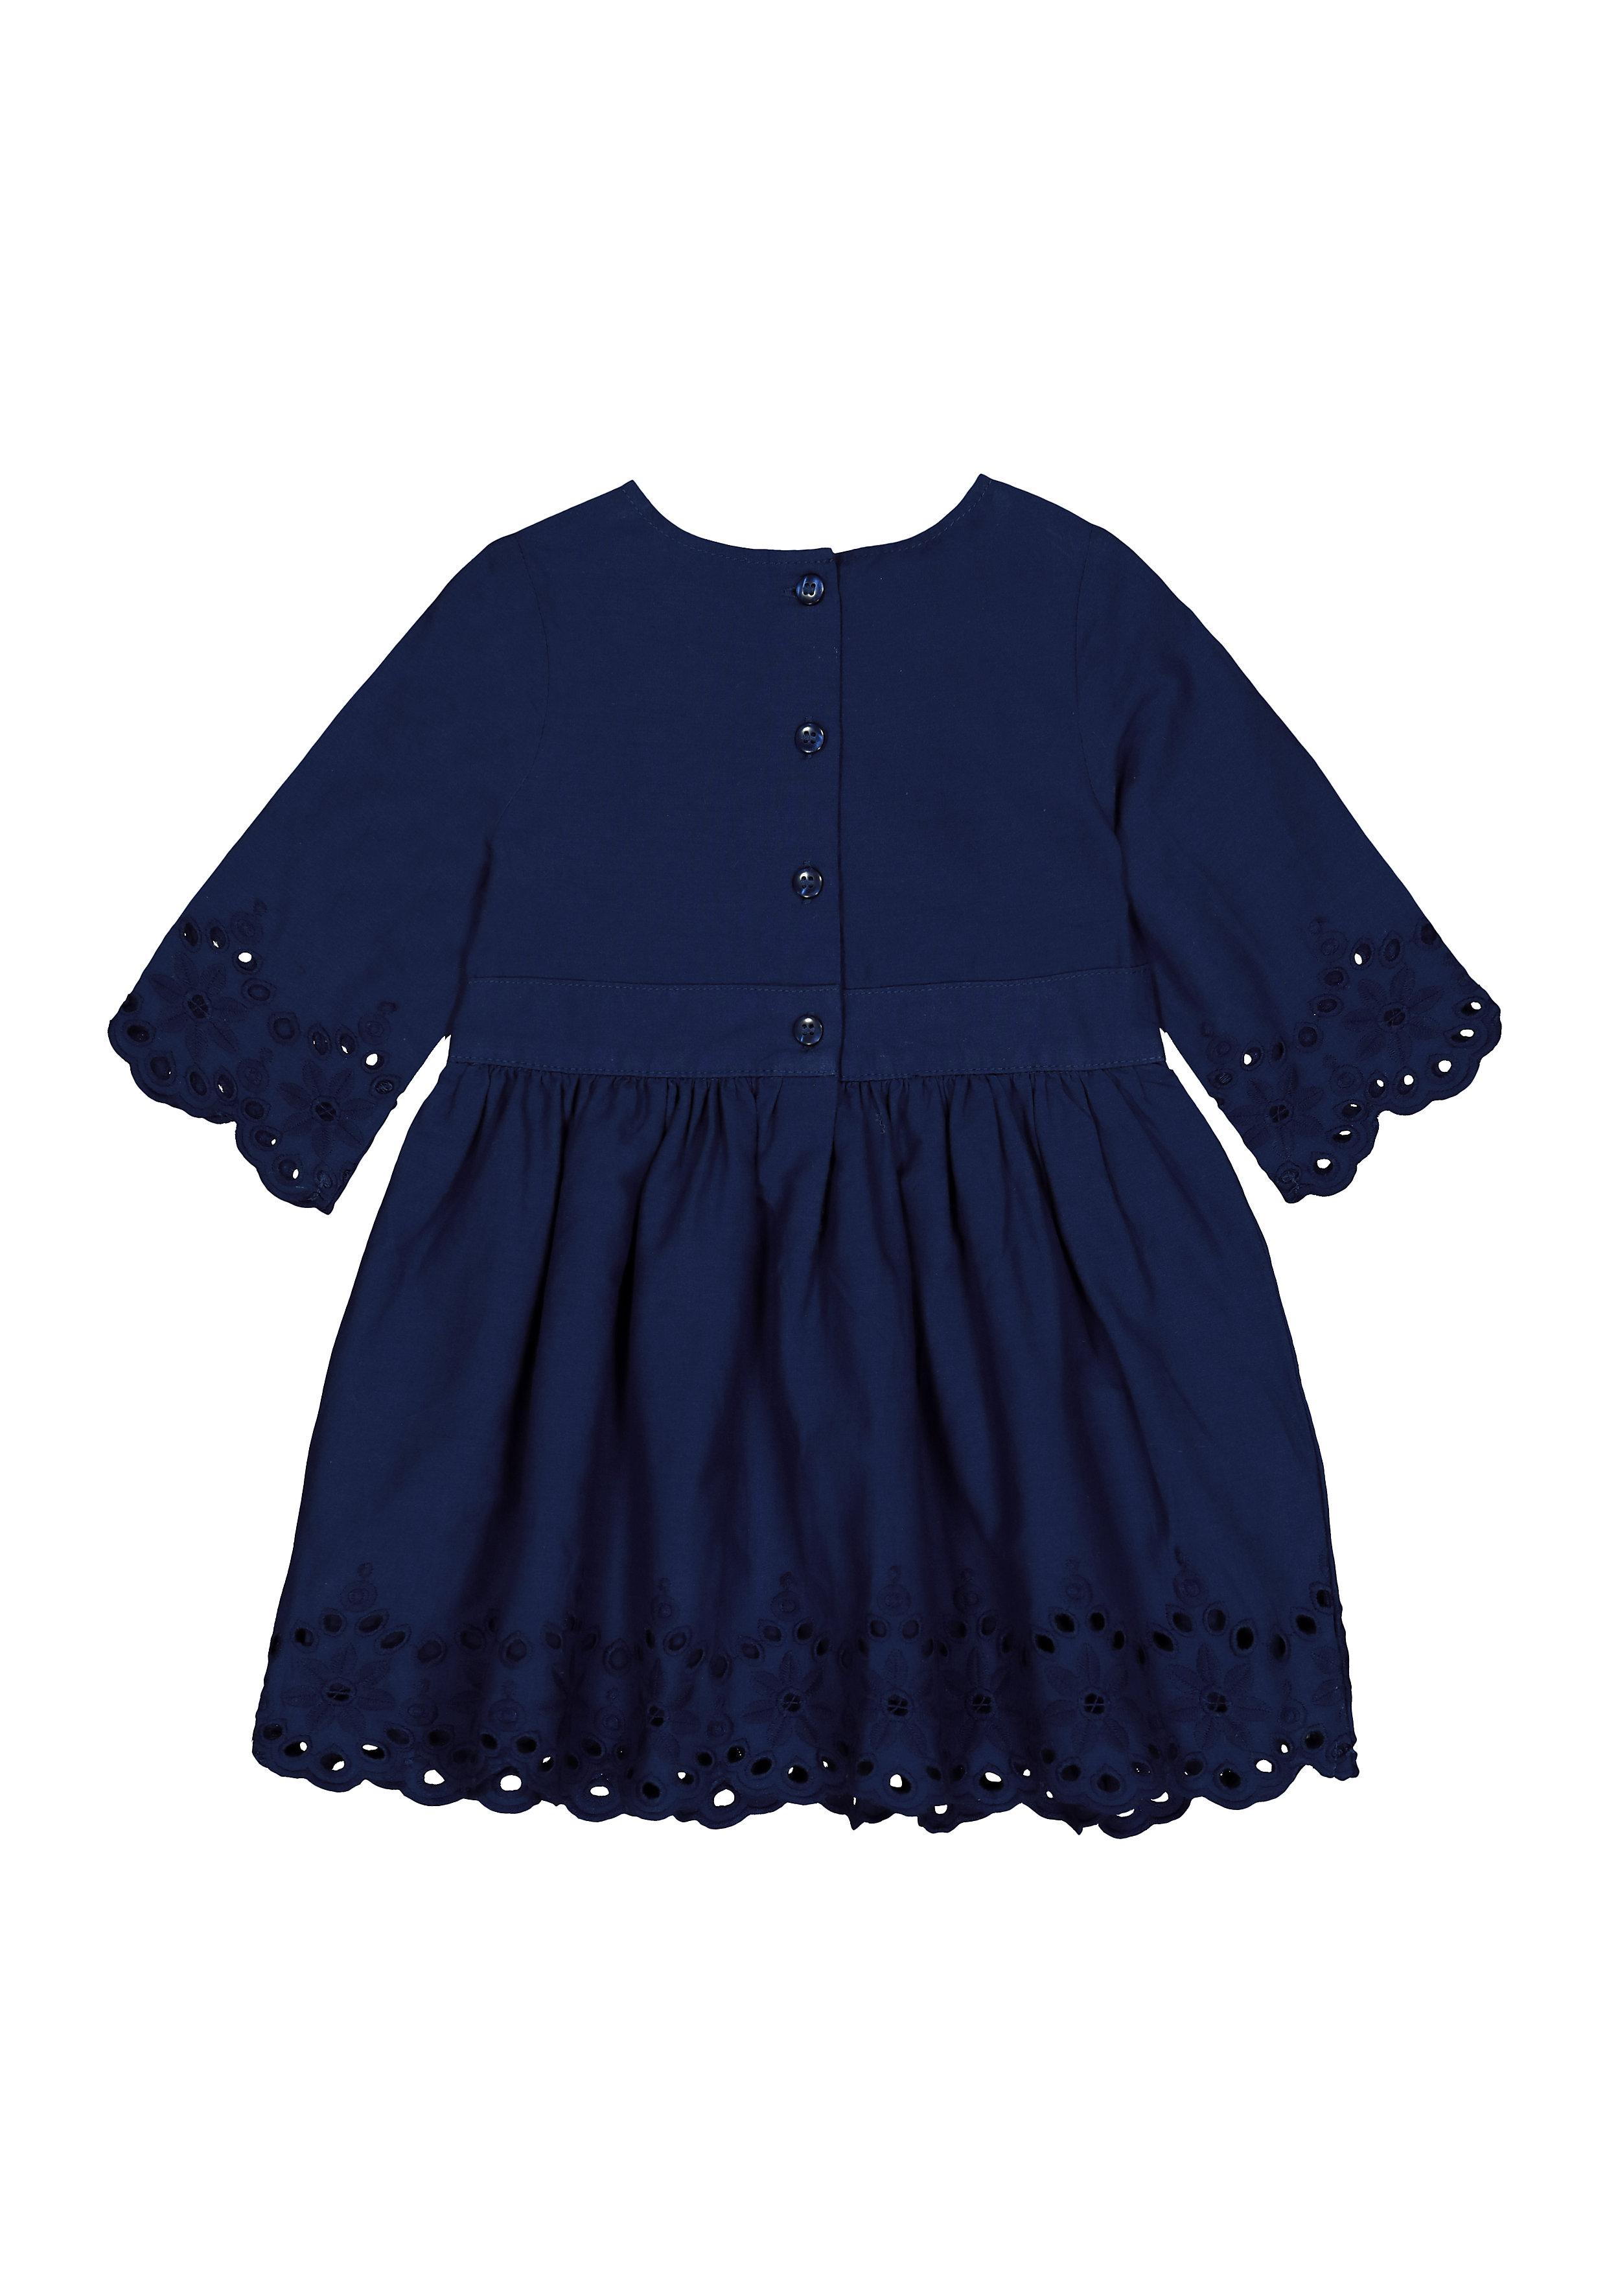 Mothercare | Girls Full Sleeves Schiffli Dress - Navy